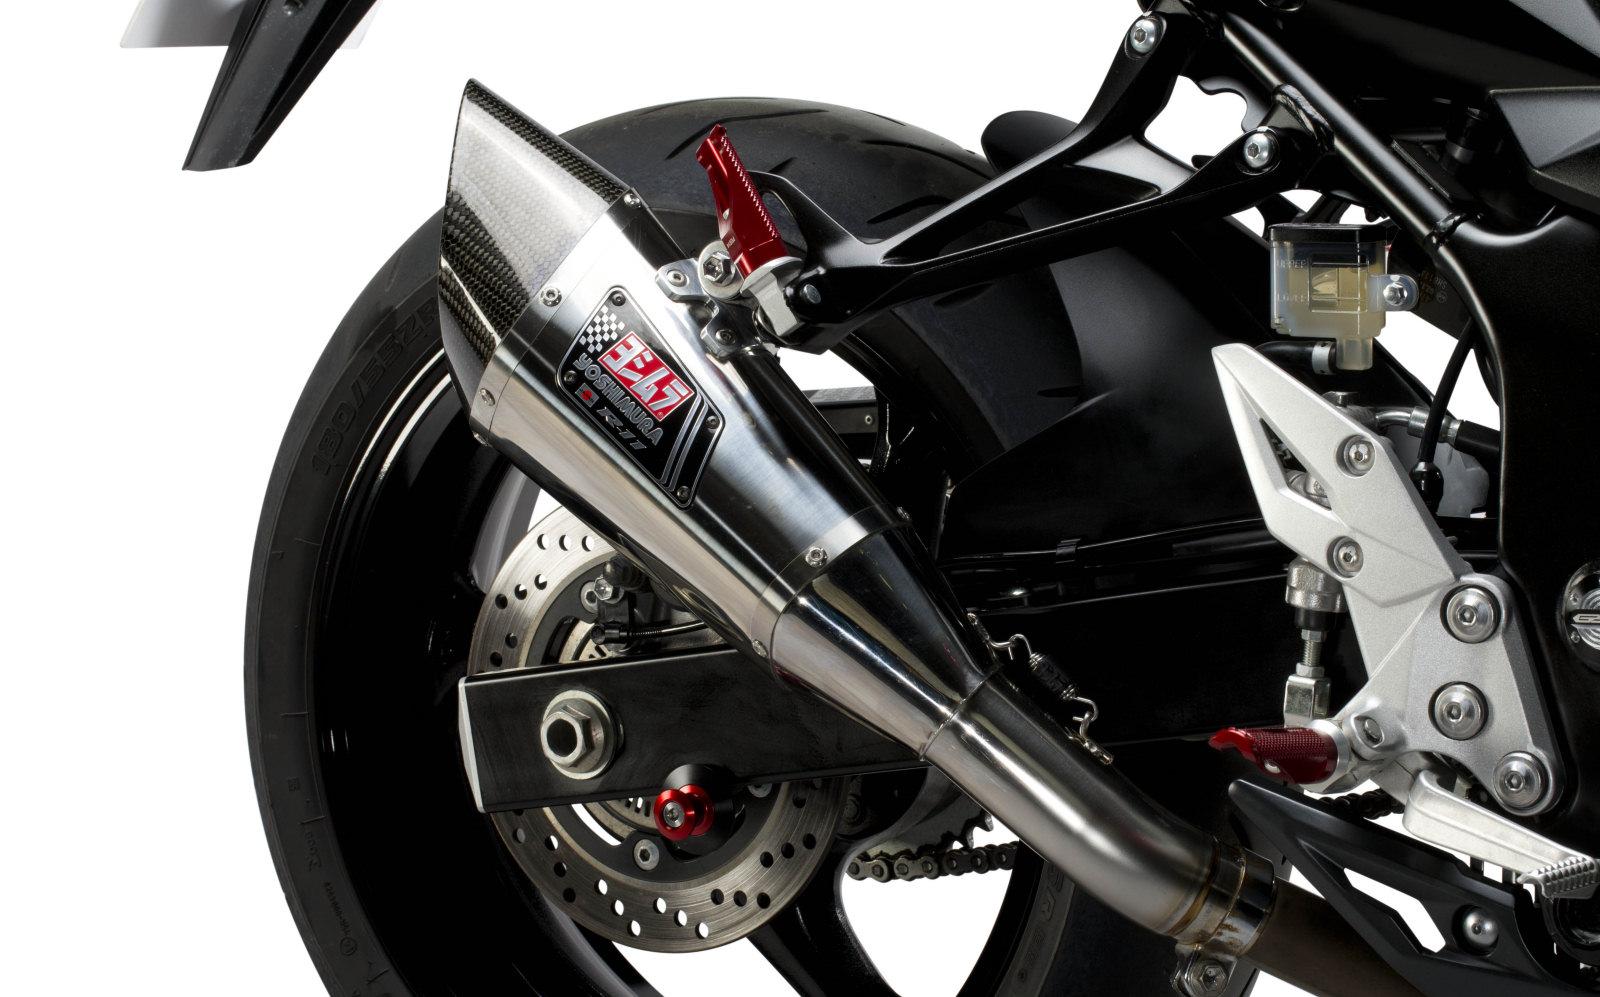 suzuki gsr 750 street edition 2014 galerie moto motoplanete. Black Bedroom Furniture Sets. Home Design Ideas